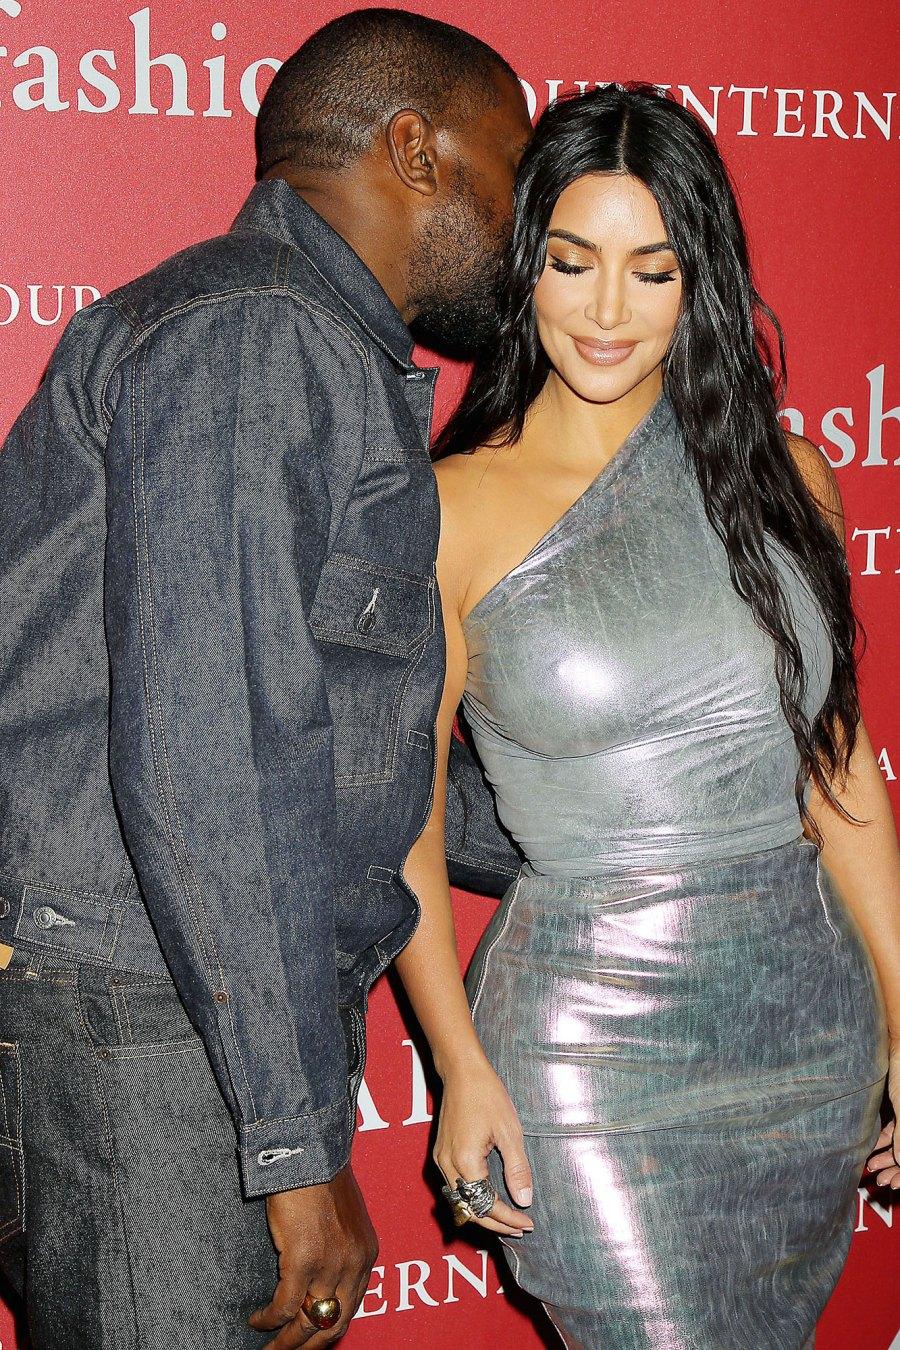 All Times That Kanye West Seemingly Referenced Kim Kardashian Donda